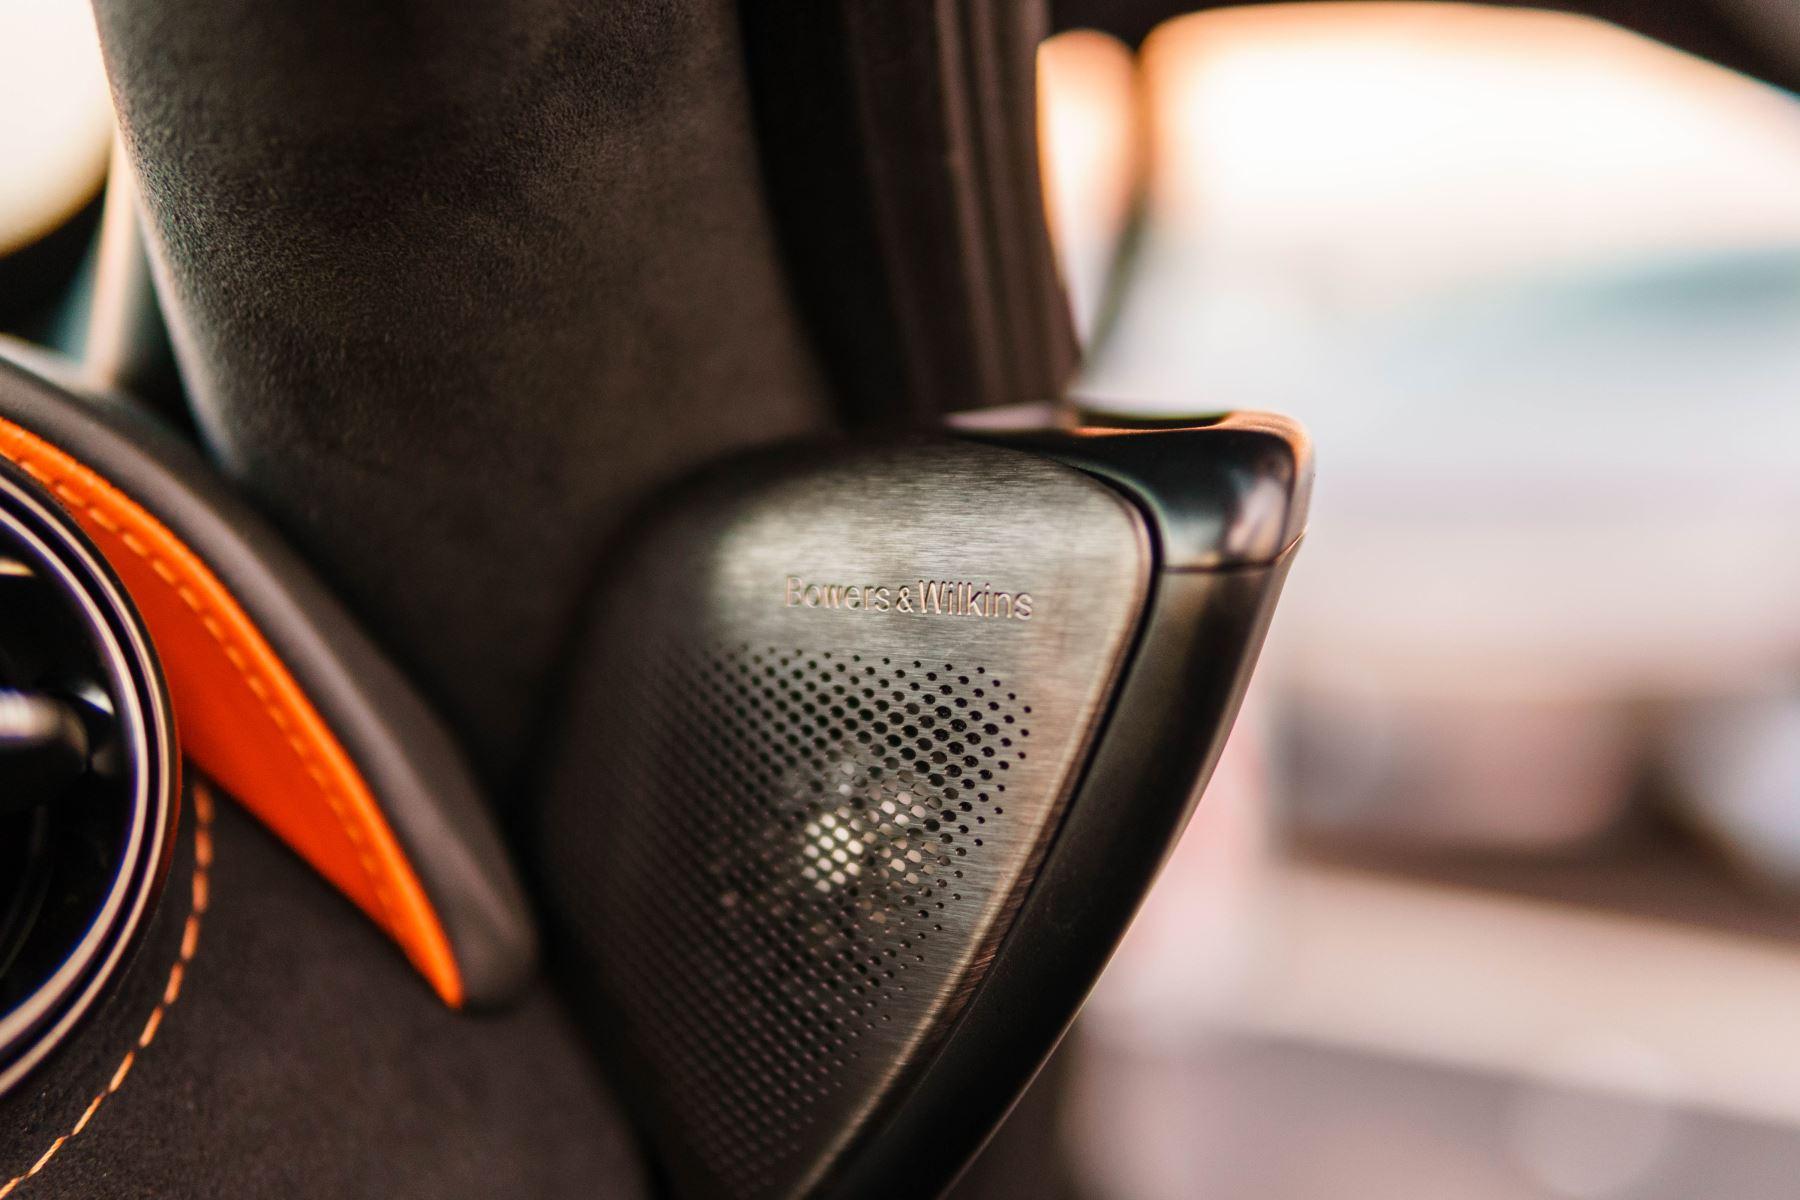 McLaren 720S Performance Coupe  image 22